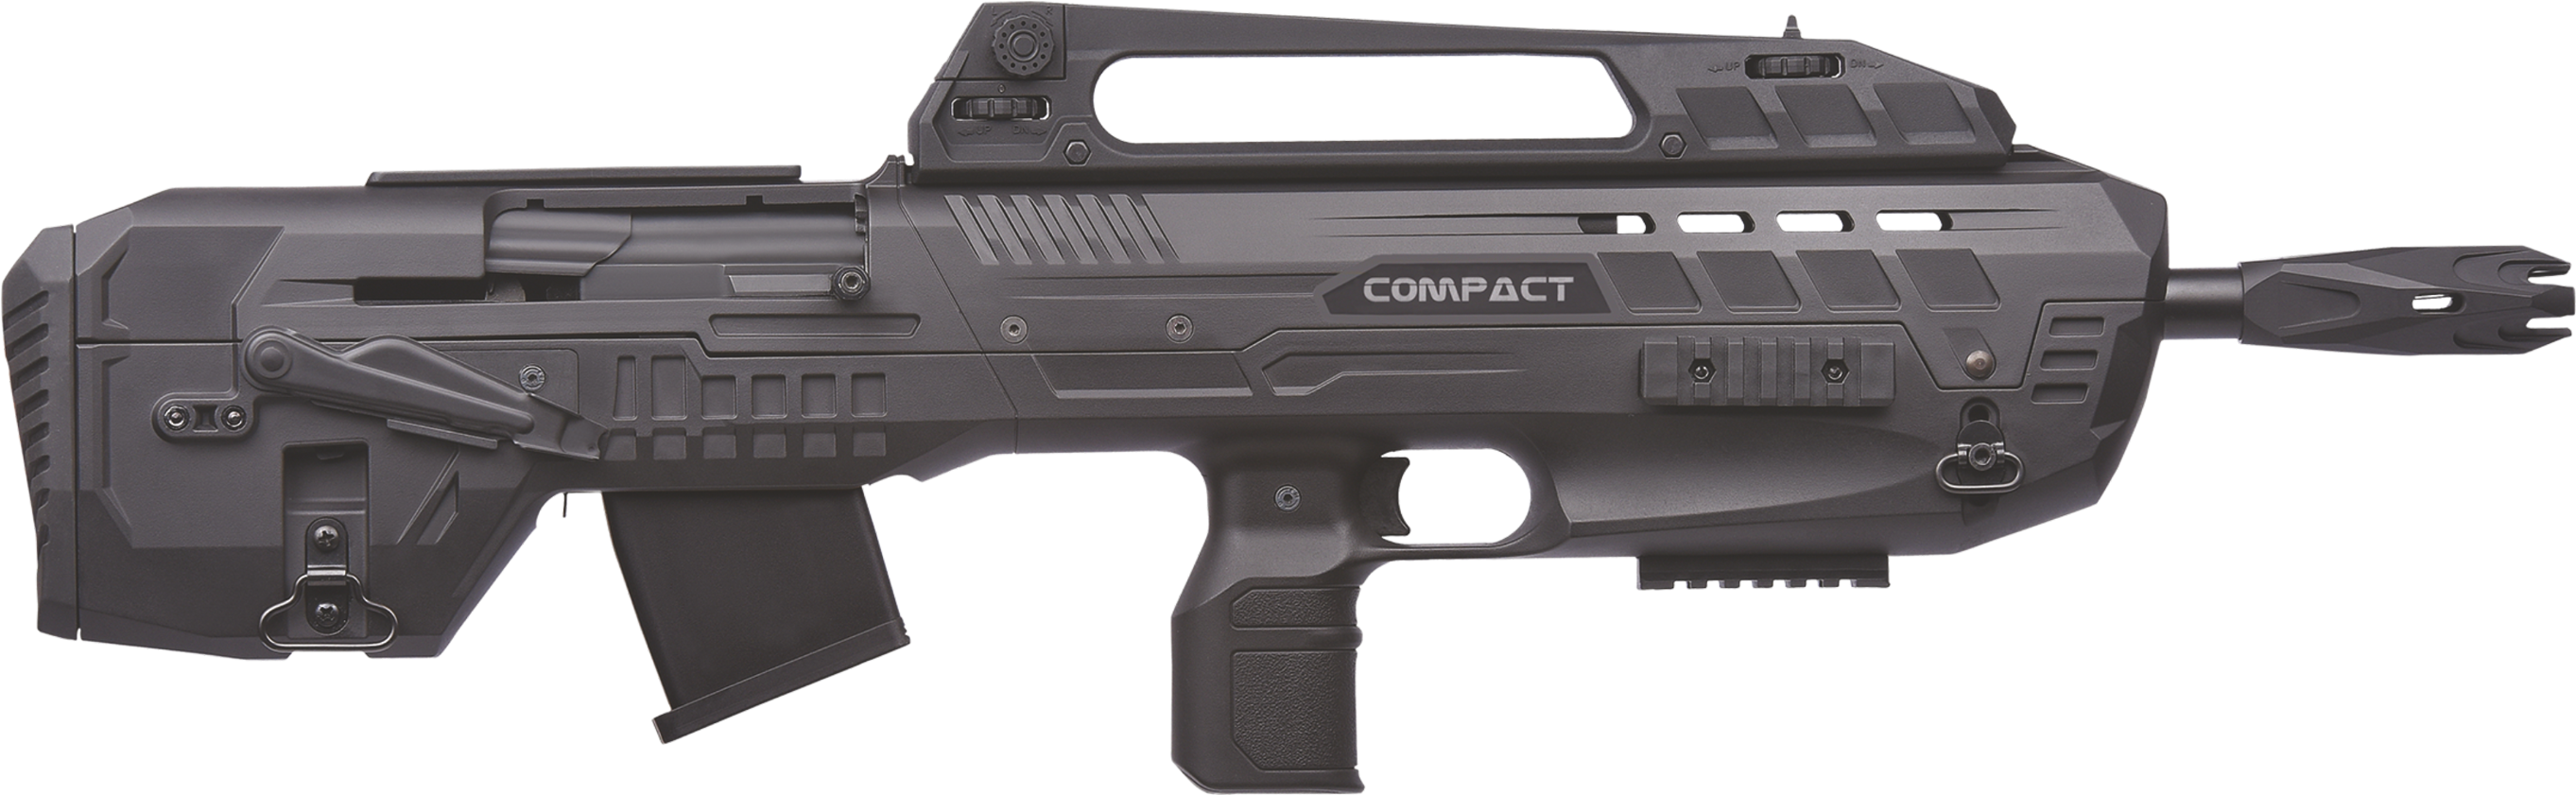 Tristar over and under 12 gauge shotgun clipart svg free library HD Tactical Shotgun, Concept Weapons, Lever Action, Weapons ... svg free library